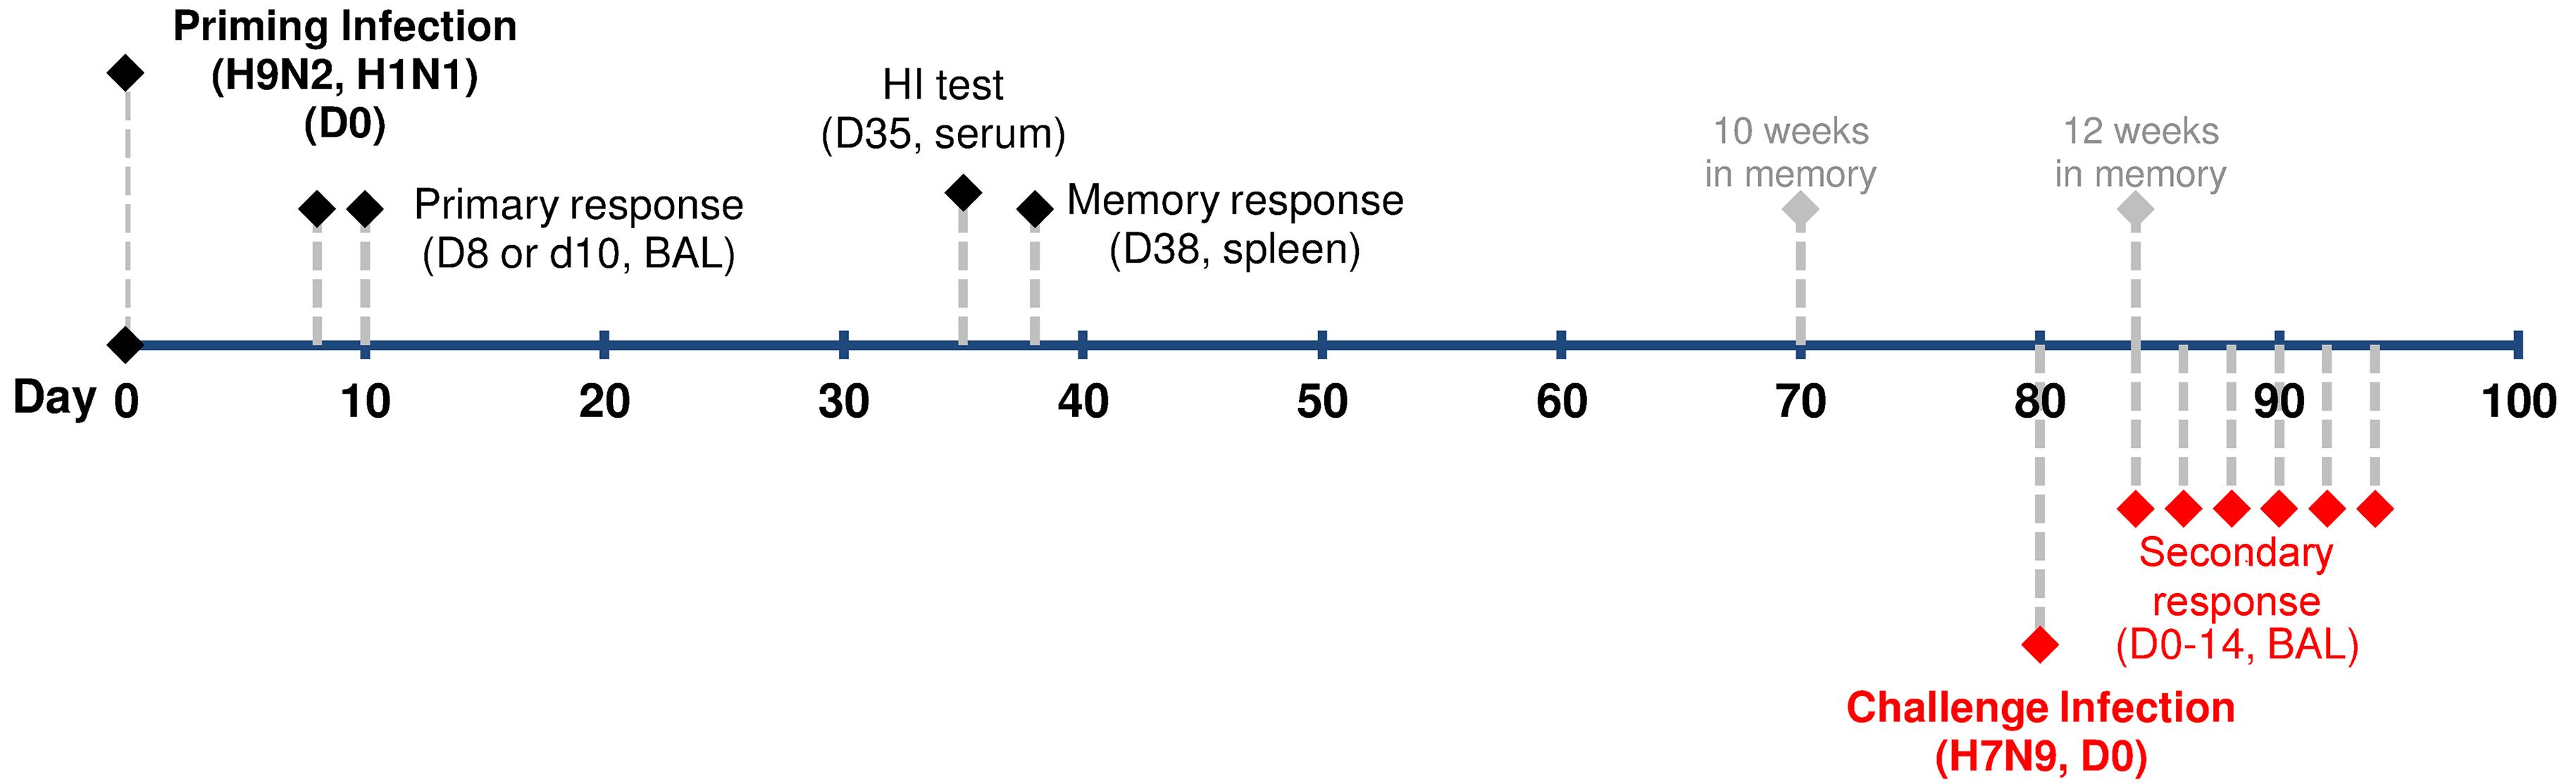 Experimental design for analyzing CTL-mediated heterosubtypic immunity against H7N9 virus infection.